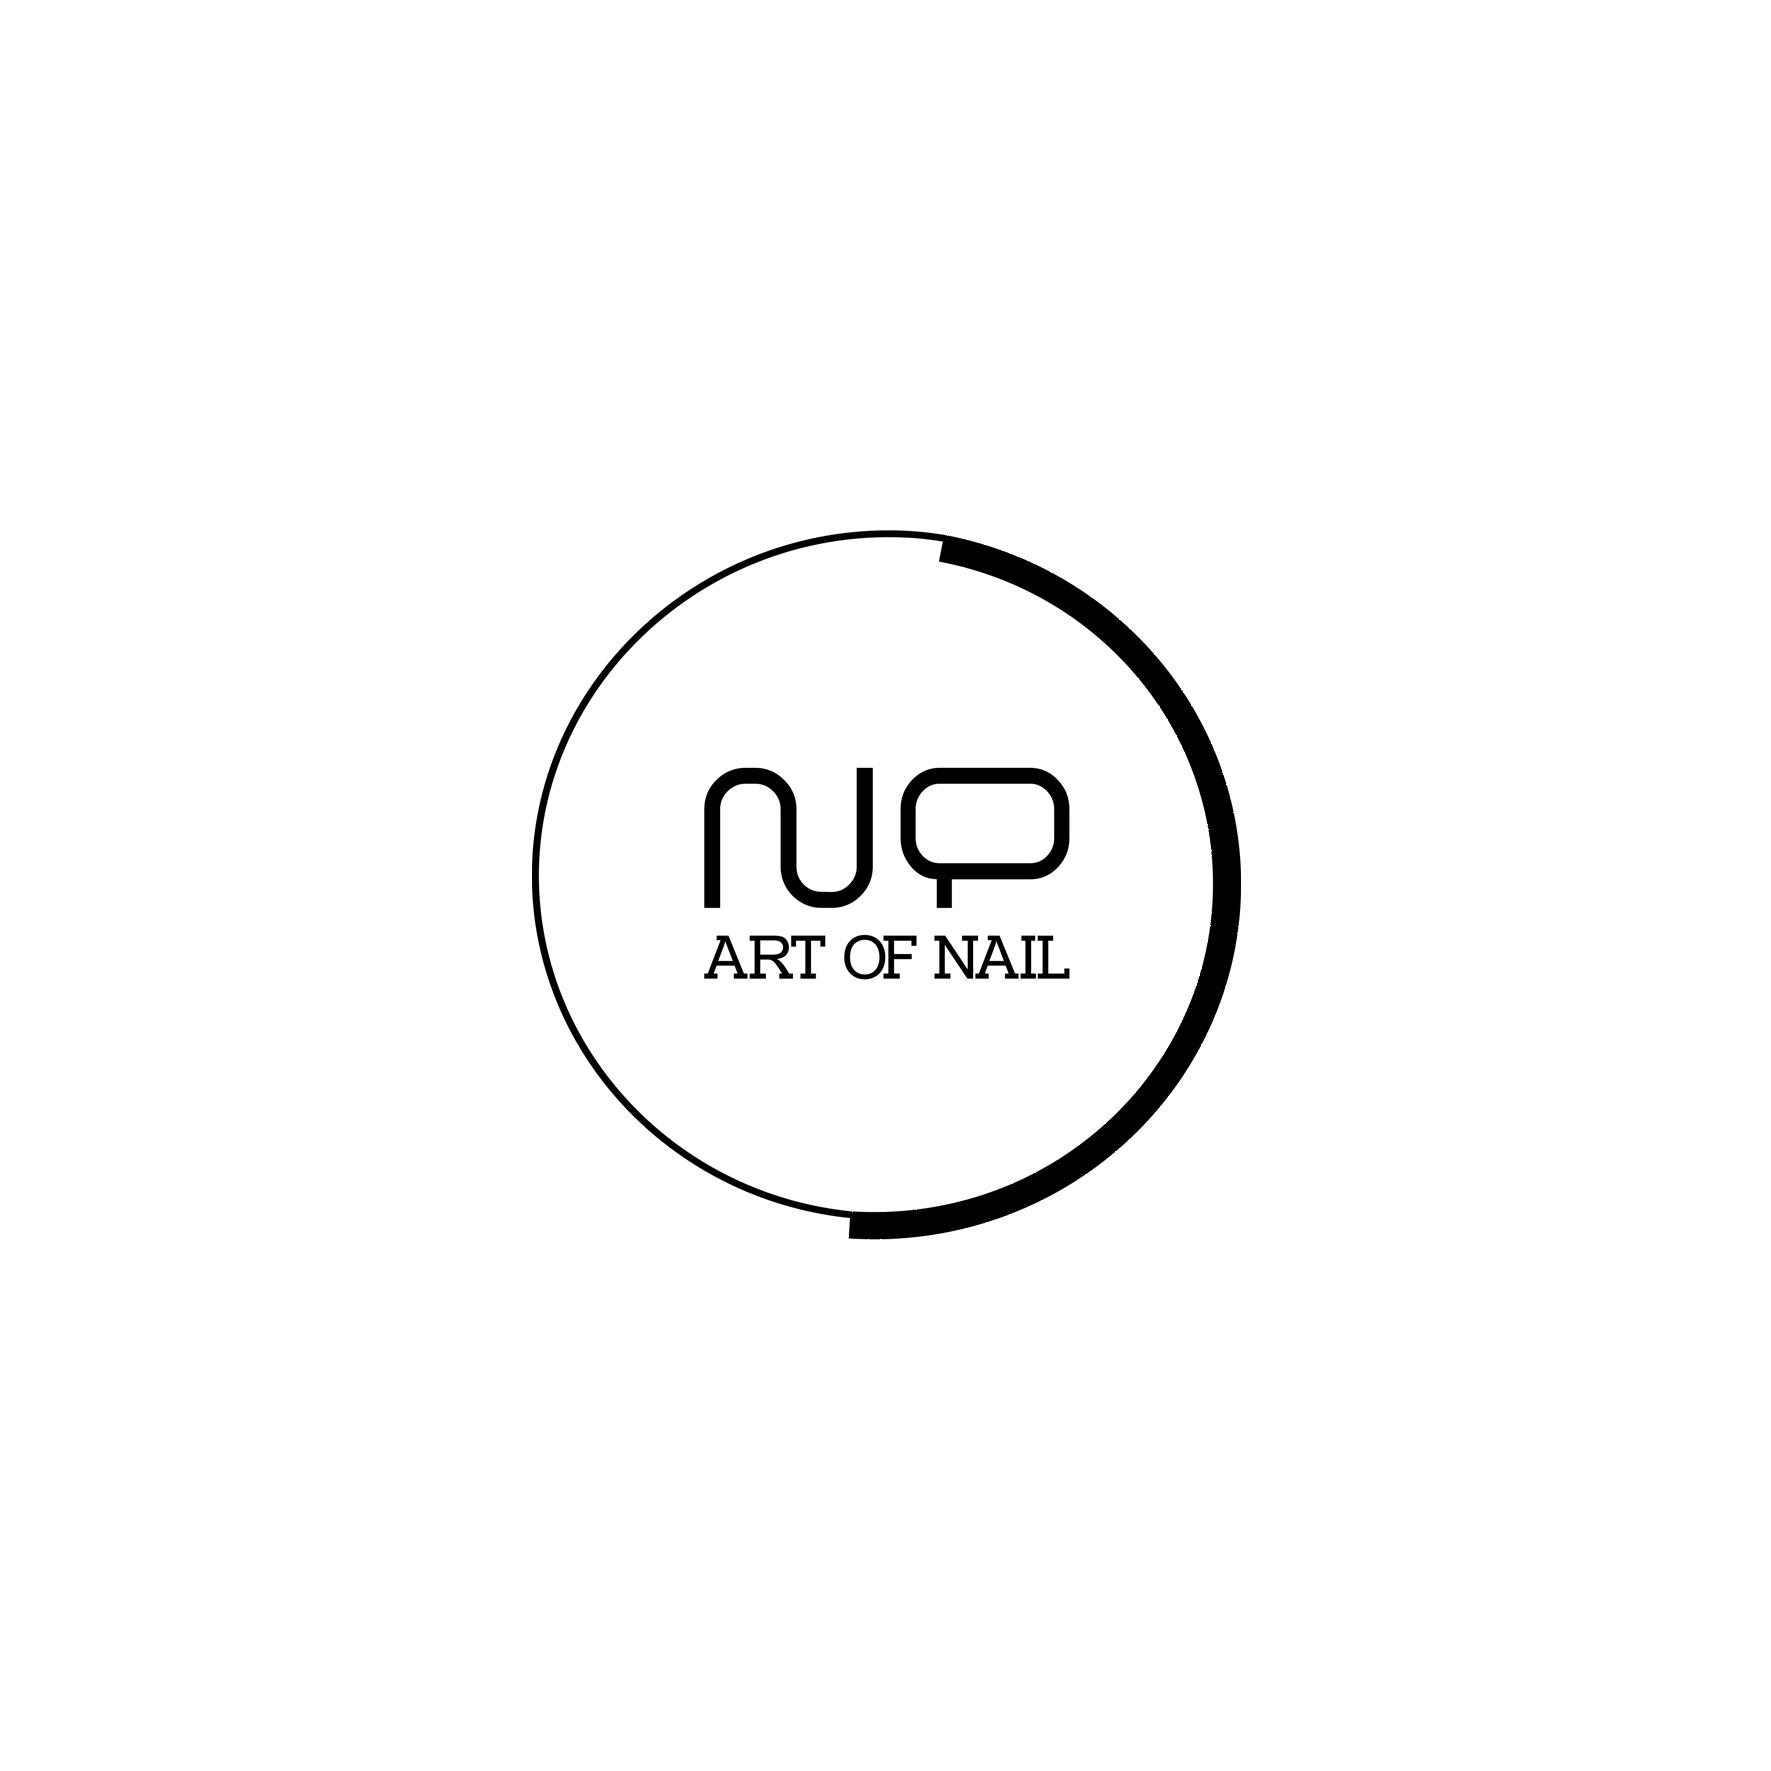 https://0501.nccdn.net/4_2/000/000/048/0a6/logo-nikoleta-by-koukida-1771x1771.jpg